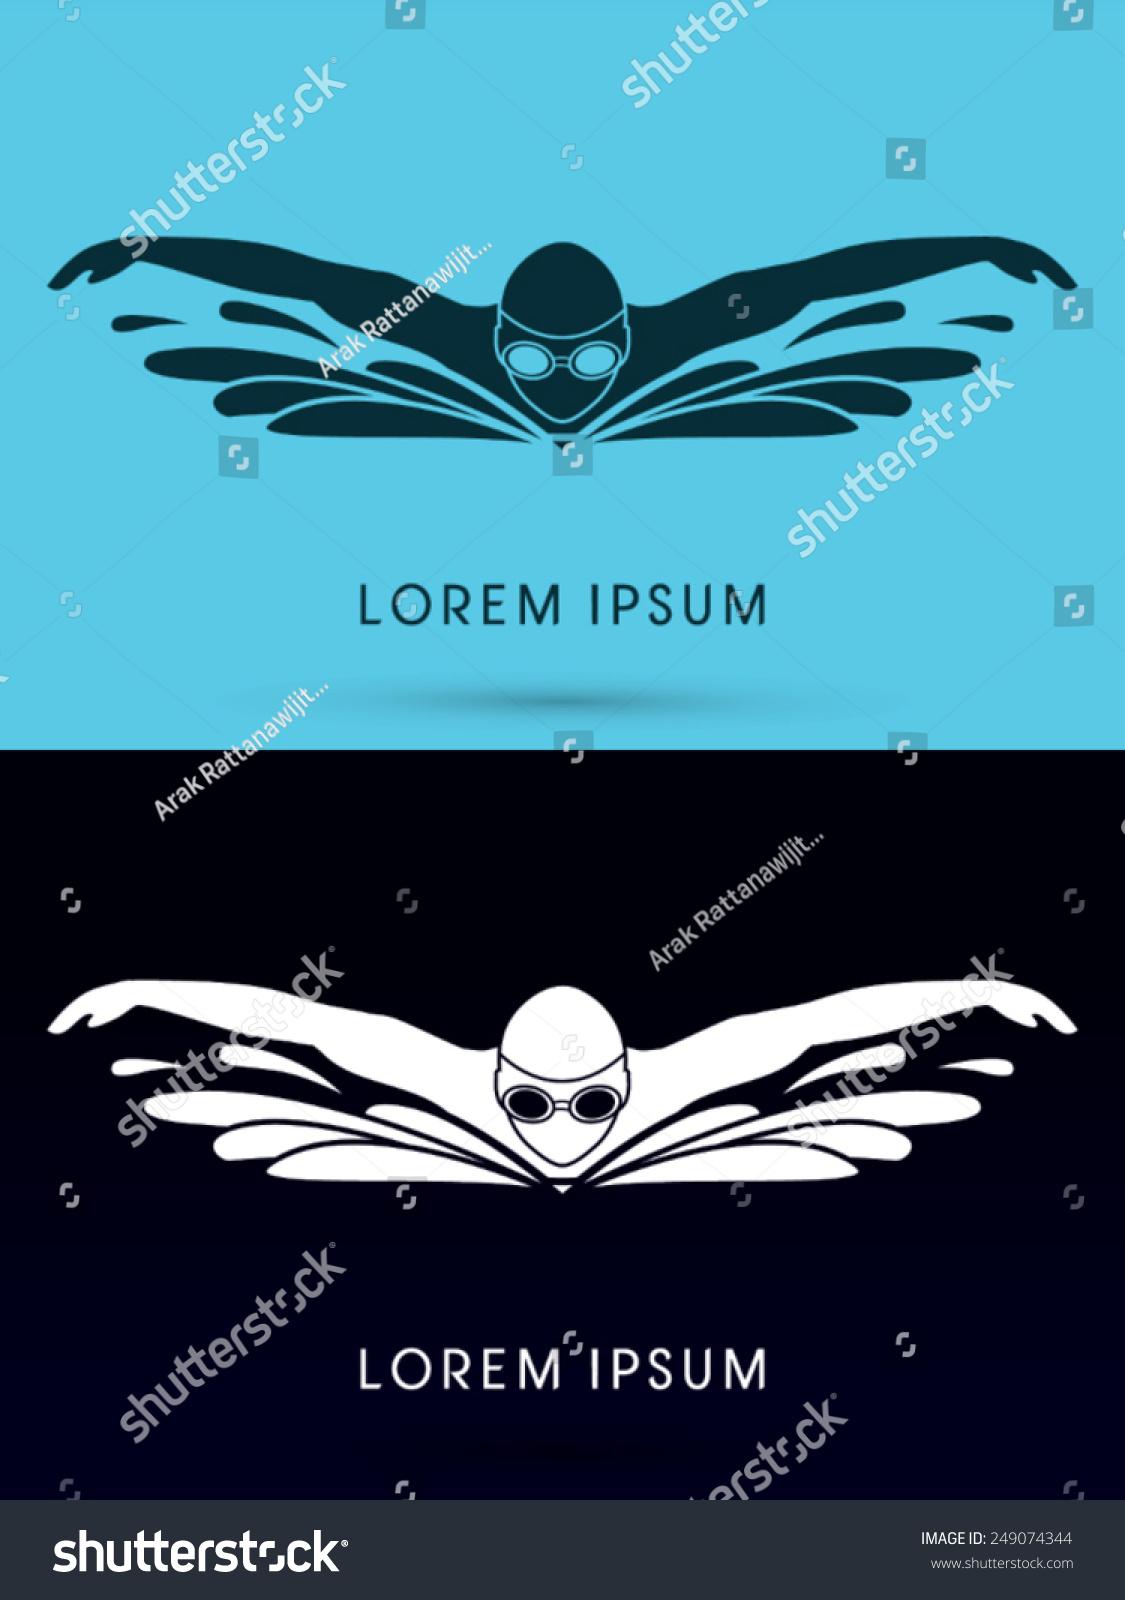 Swimming Pool Cleaning Symbols : Swimming symbols